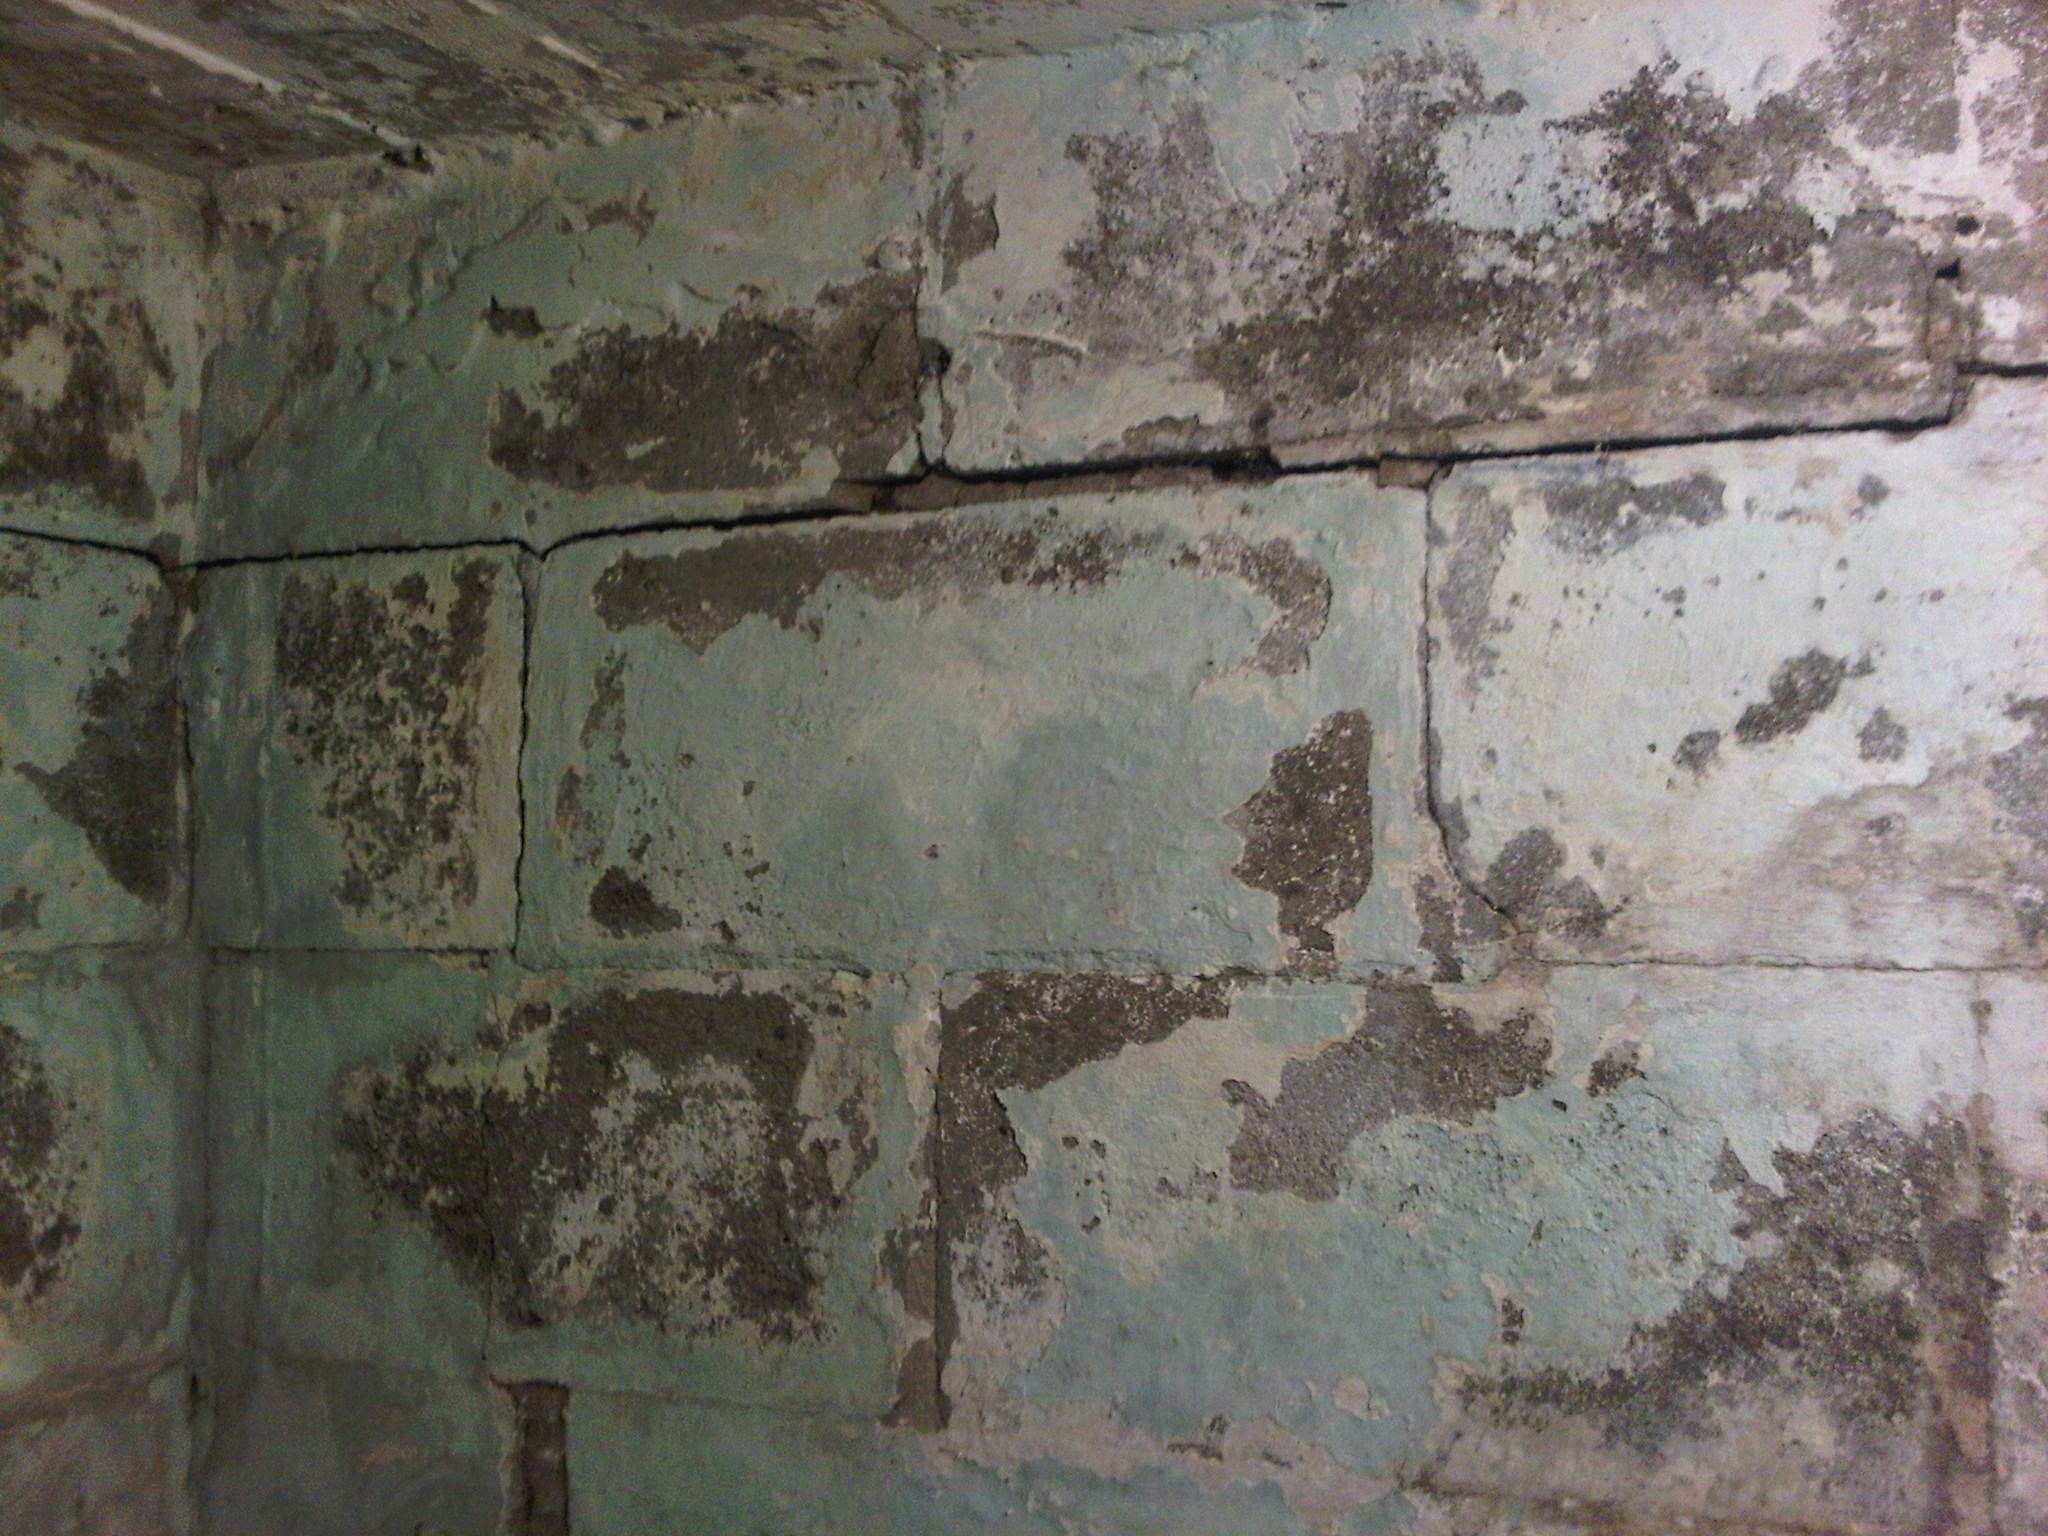 Patching Cinder Block Drylok Cinder Block Walls Cinder Block House Waterproofing Basement